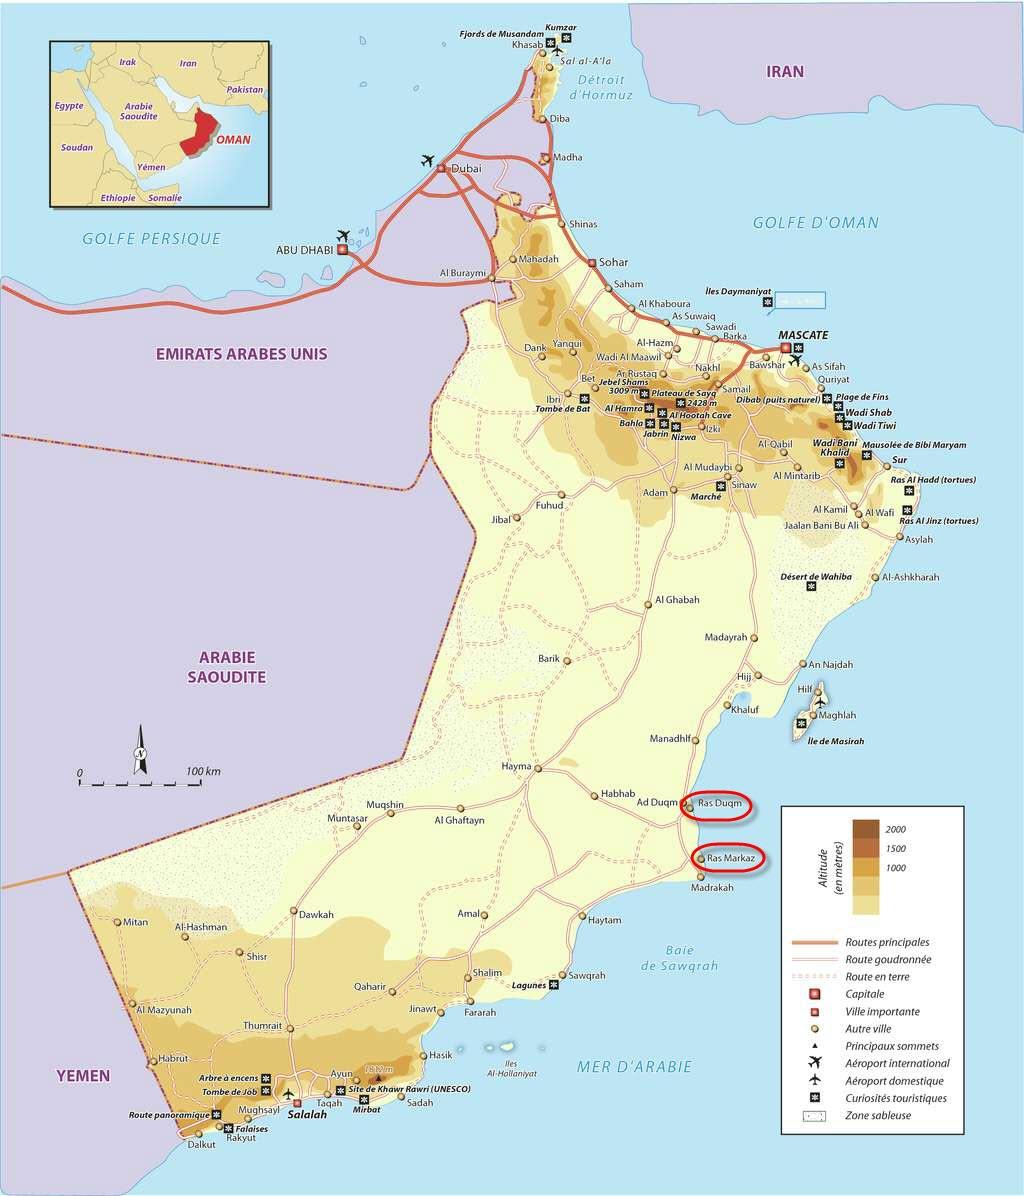 OOC_Duqm_Refinery_and_Raz-Markaz_Terminal_Map